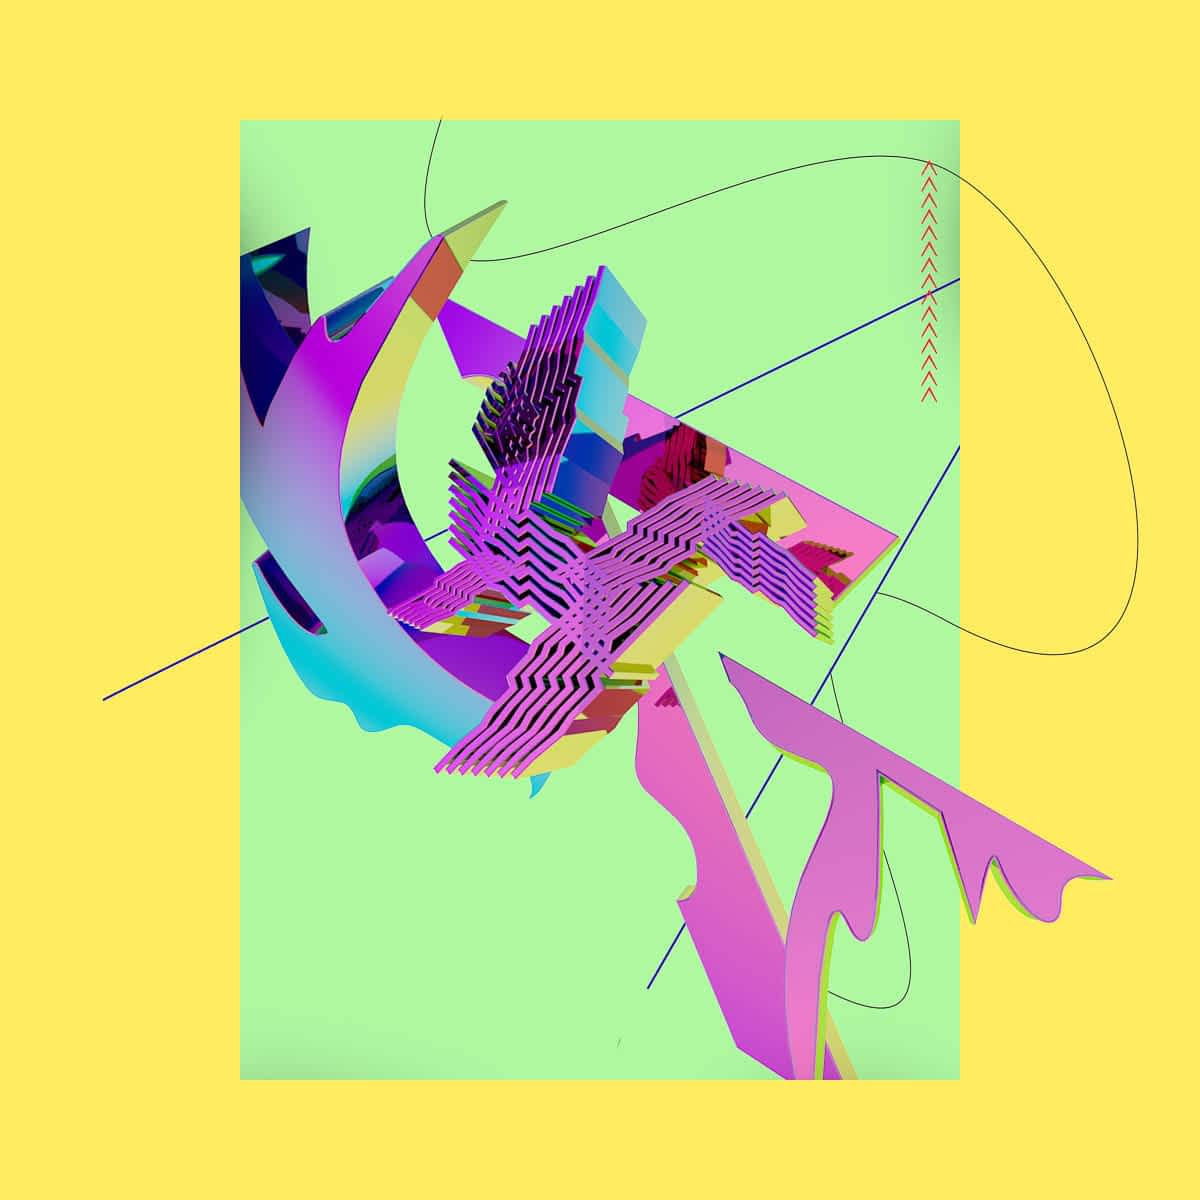 Design 23 – Change The Game